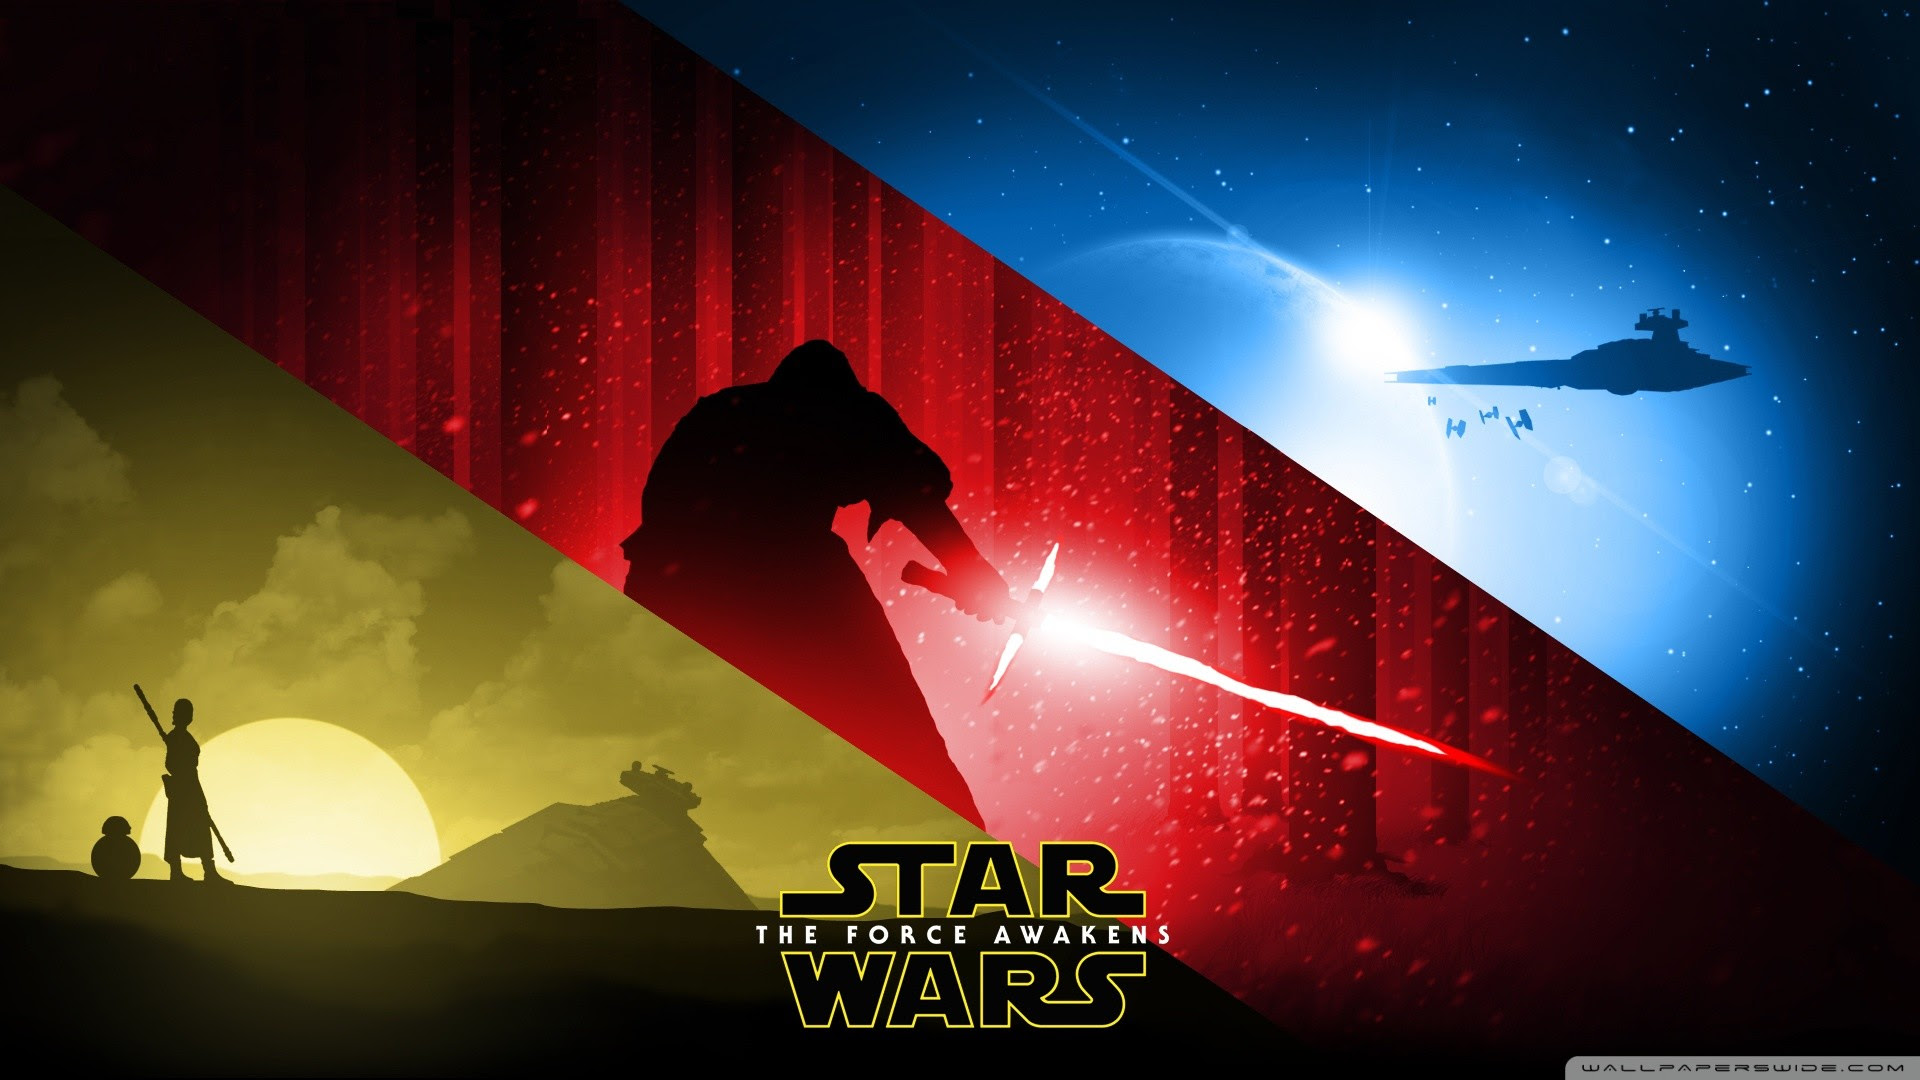 Star Wars Wallpaper 1080p 73 Images